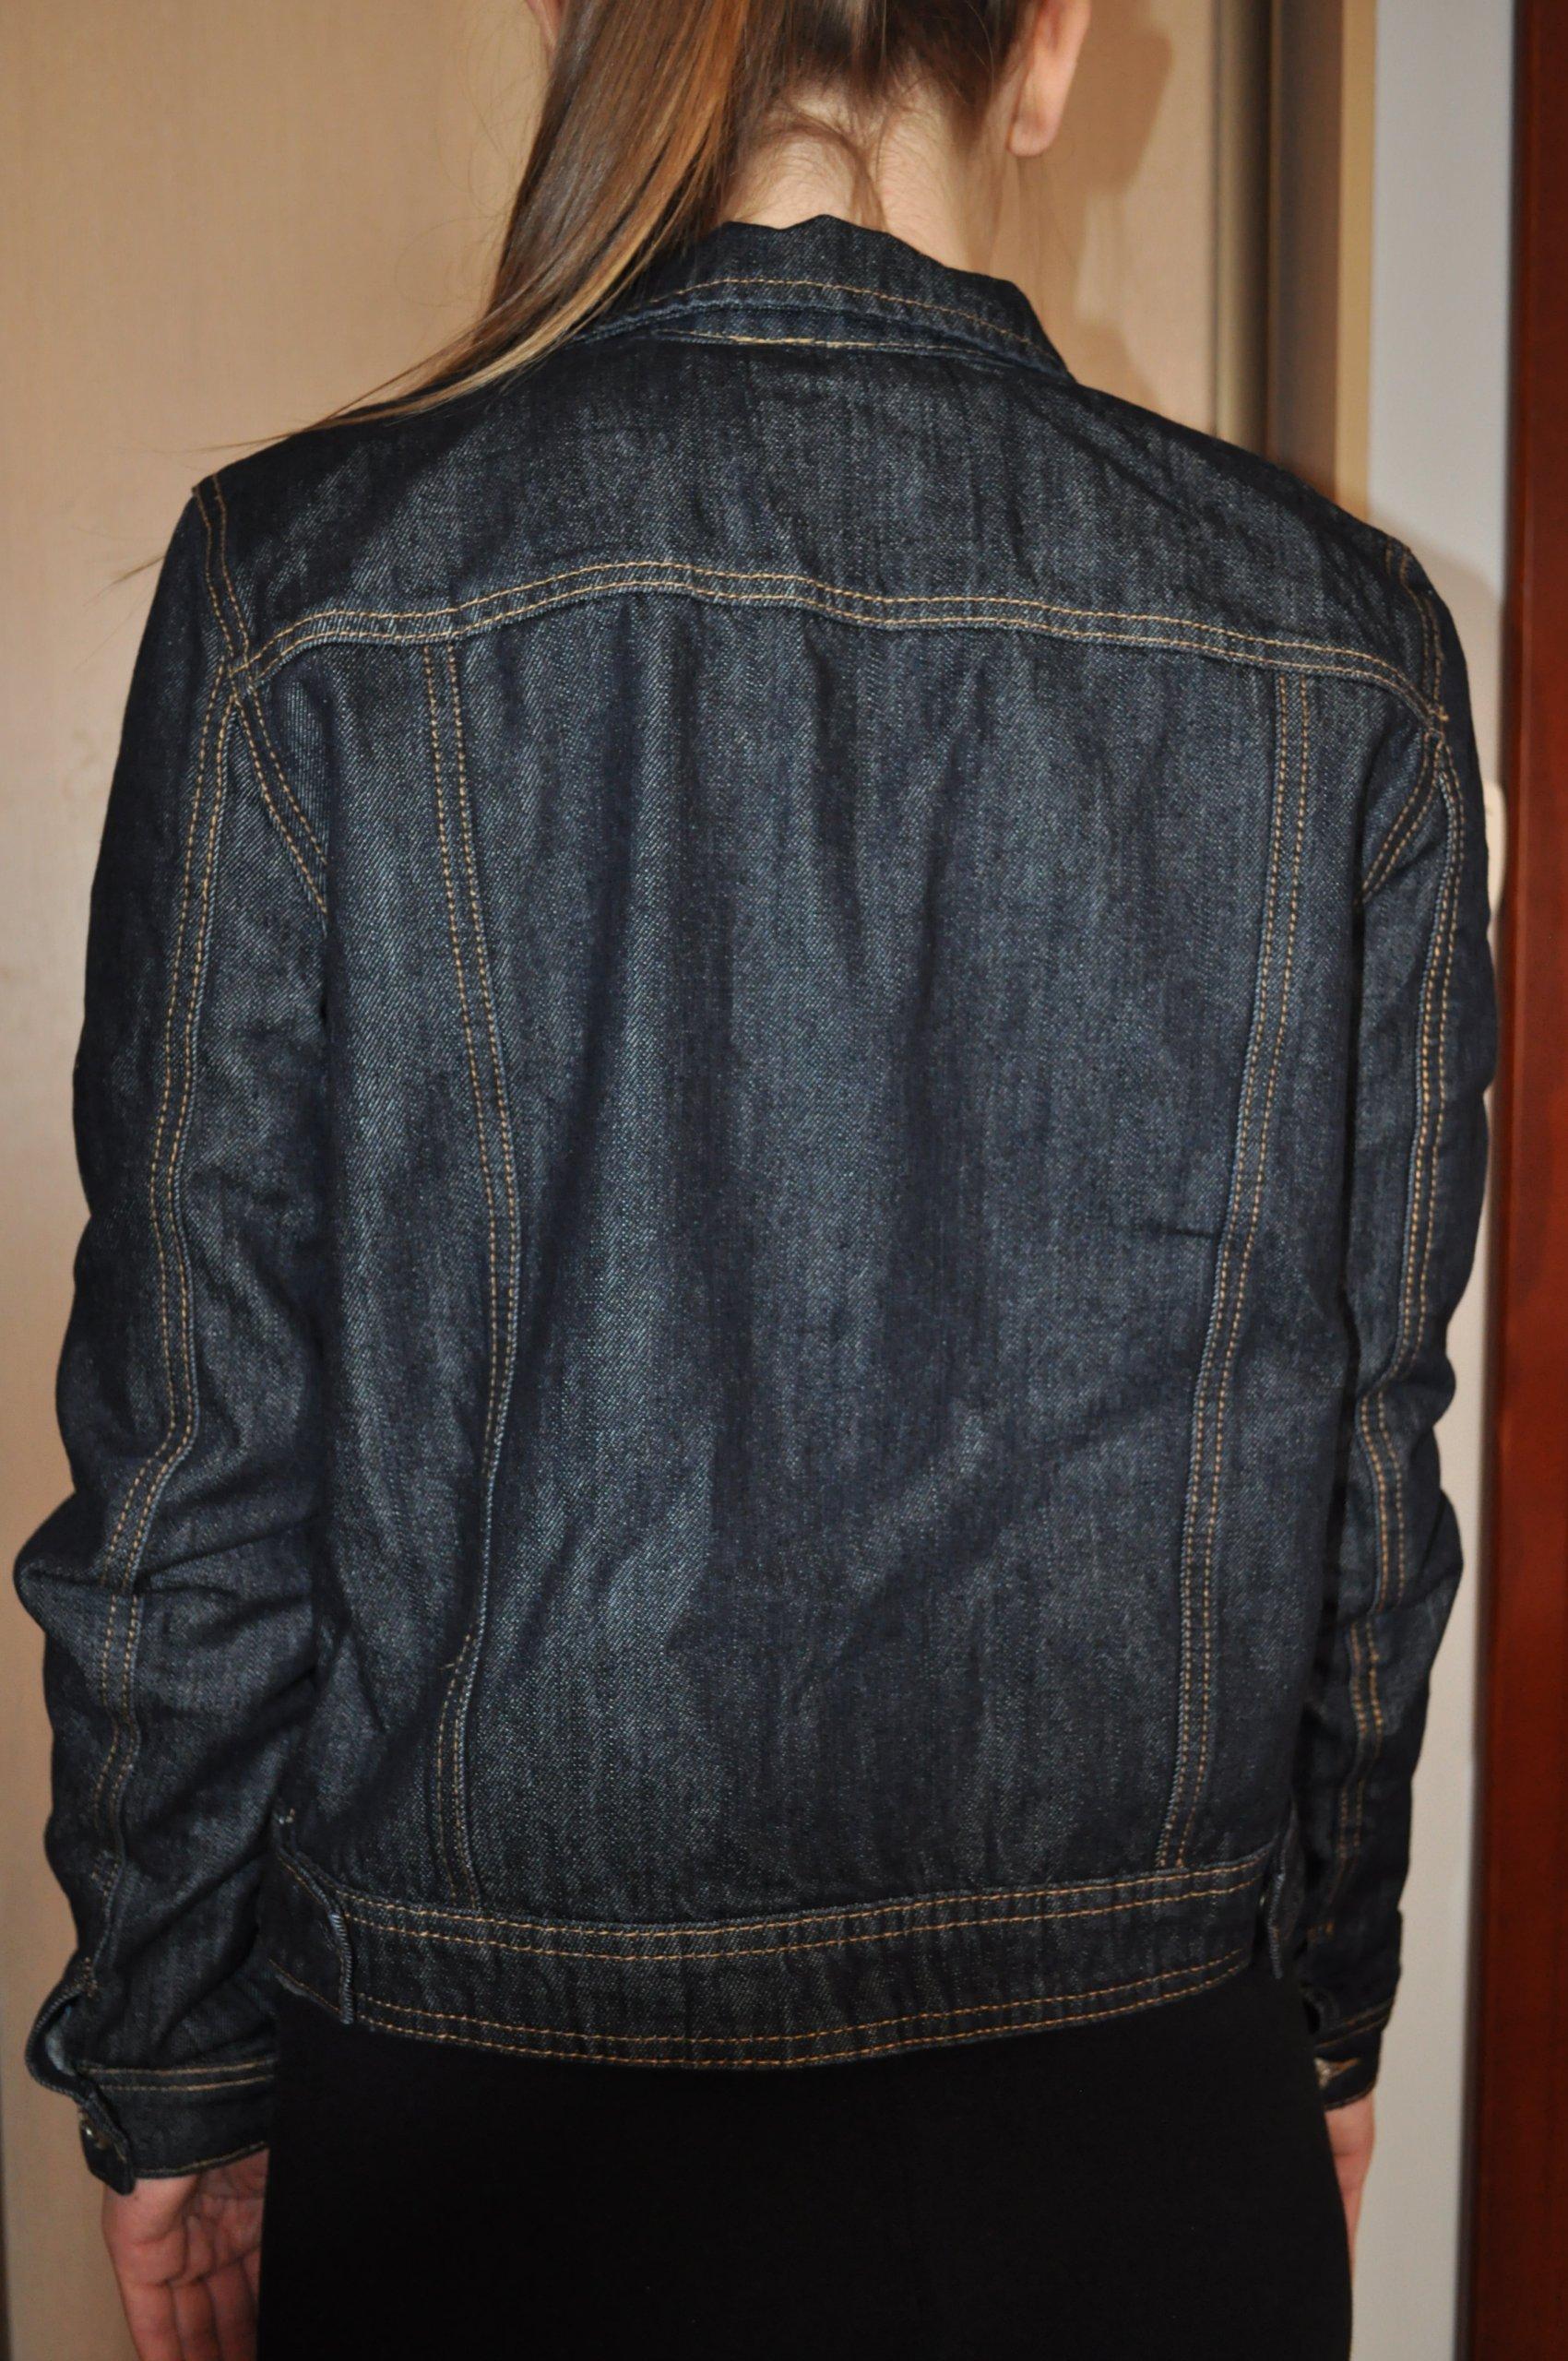 ea5ec45c08 7270496190 Jeans Cropp Archiwum Allegro Kurtka Oficjalne Damska 10qZqSt